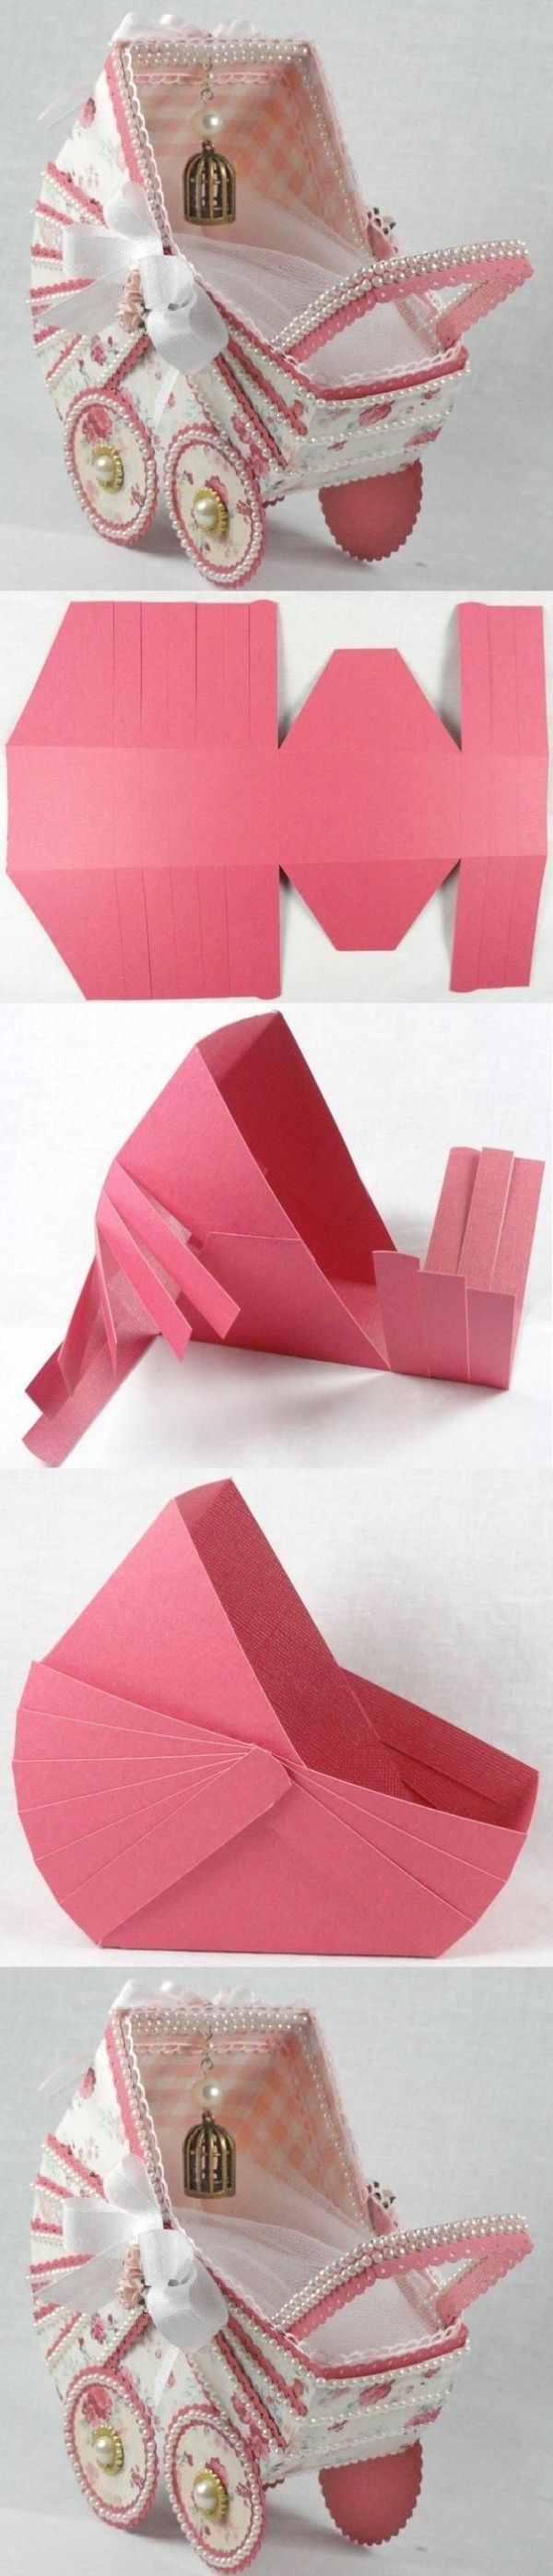 DIY Paper Stroller DIY Paper Stroller by hreshtak